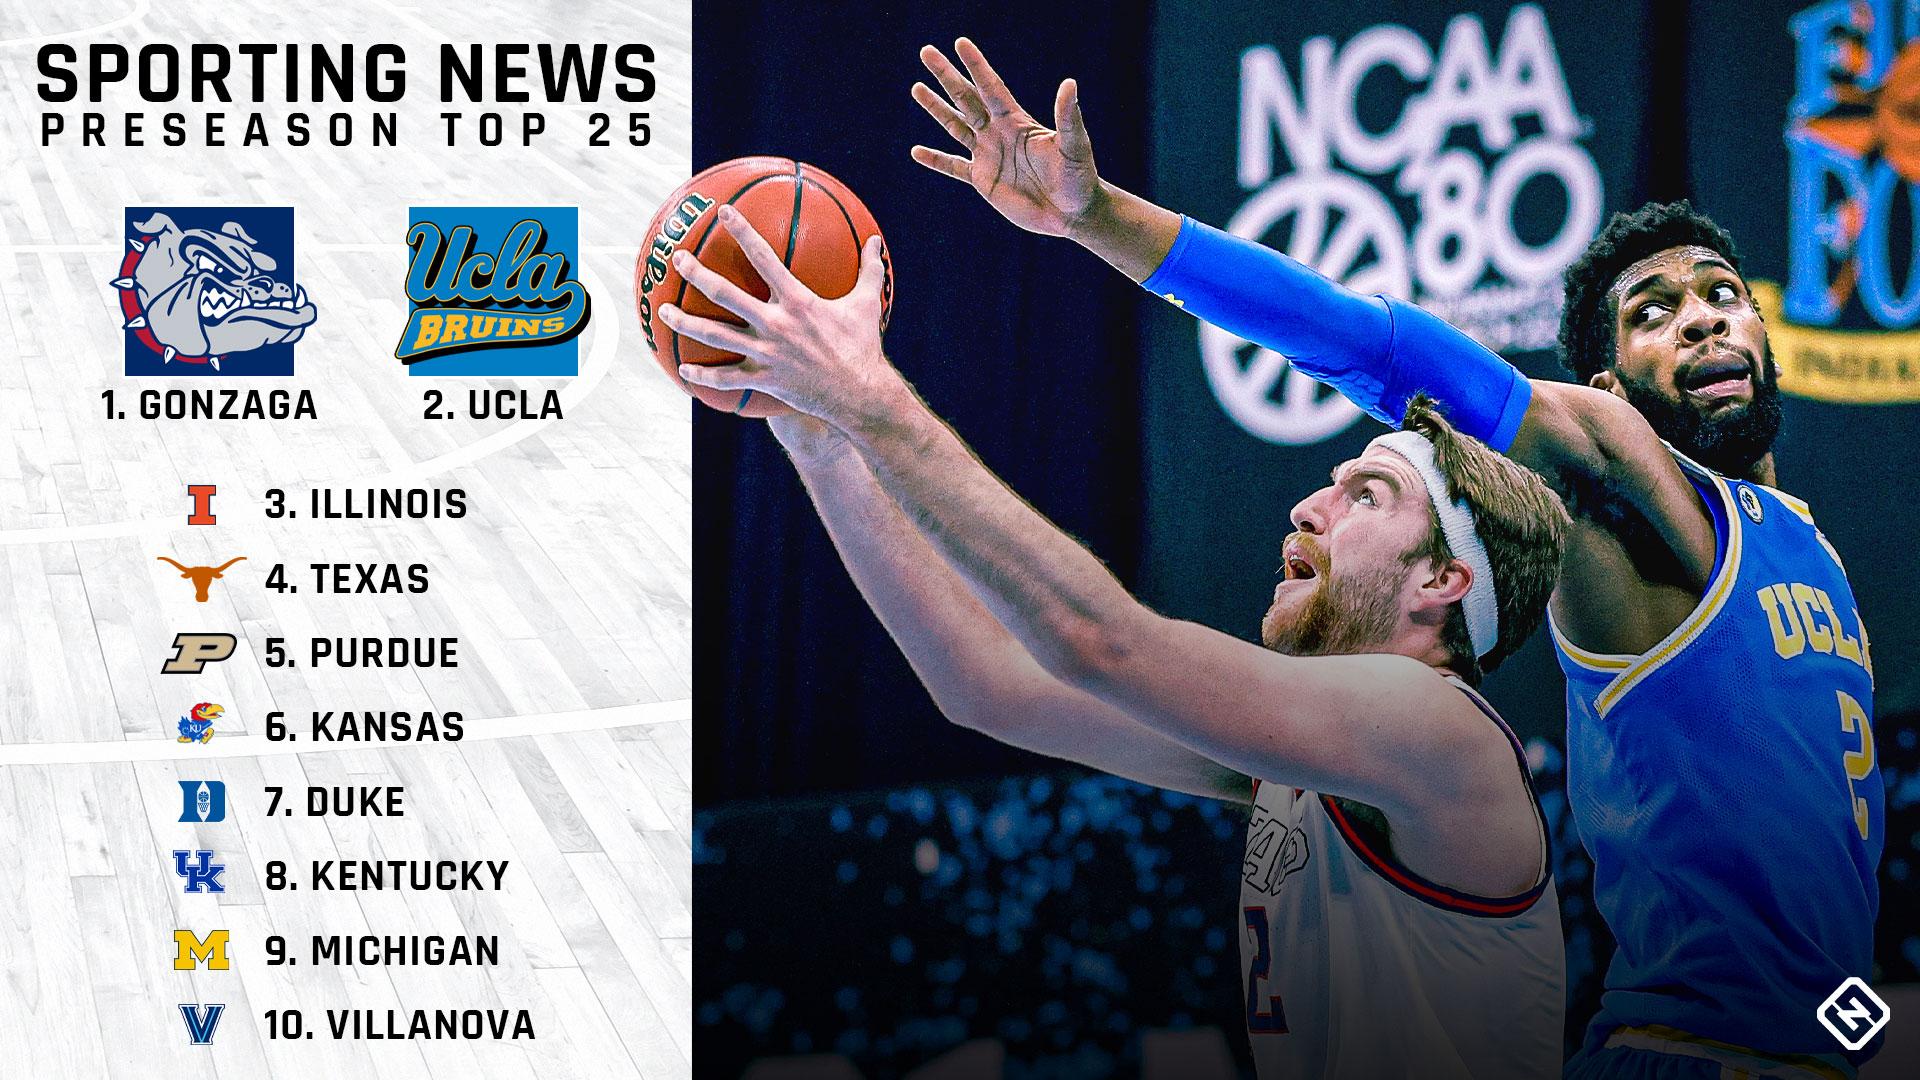 sportingnews.com - Mike DeCourcy - College basketball rankings: Gonzaga, UCLA, Illinois lead Sporting News' preseason top 25